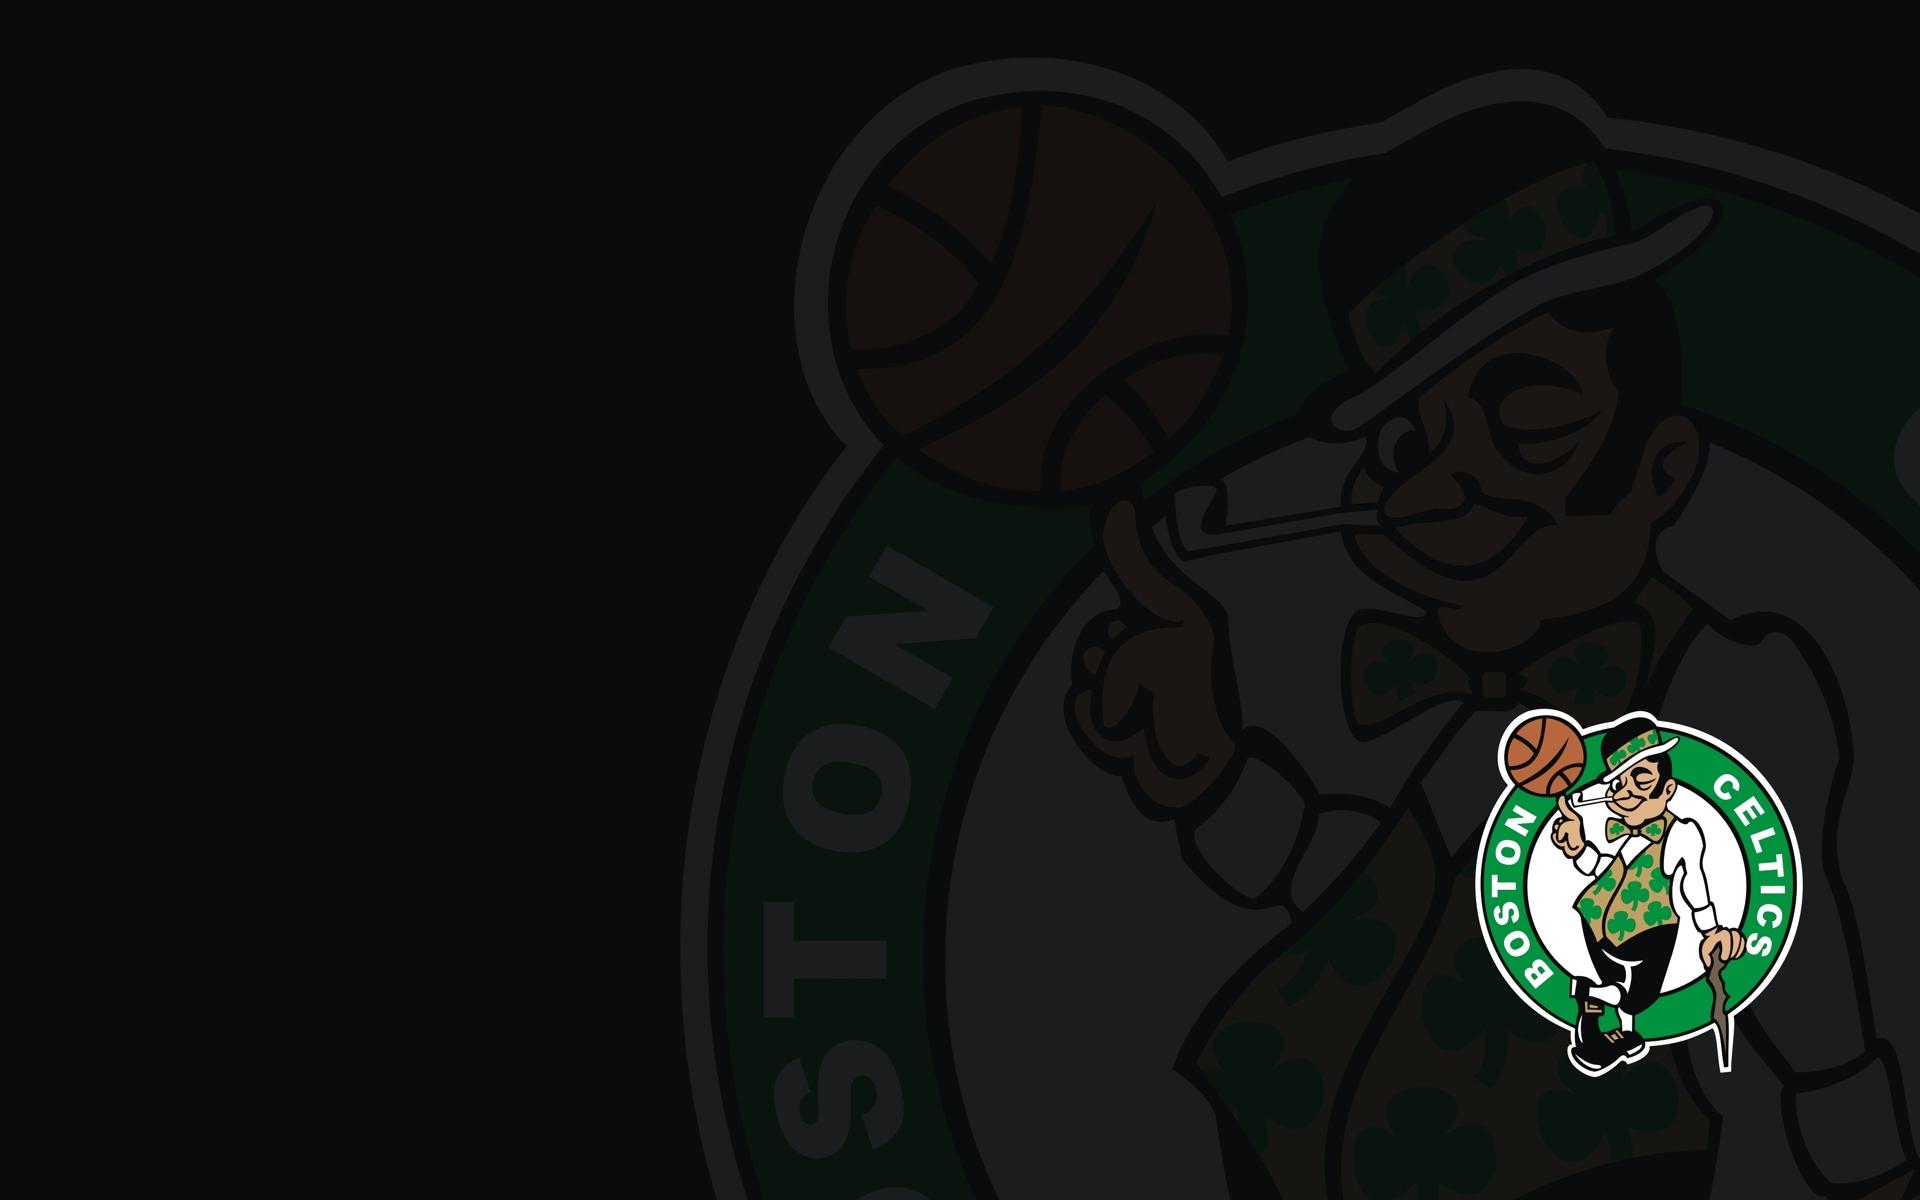 Boston Celtics IPhone Wallpaper